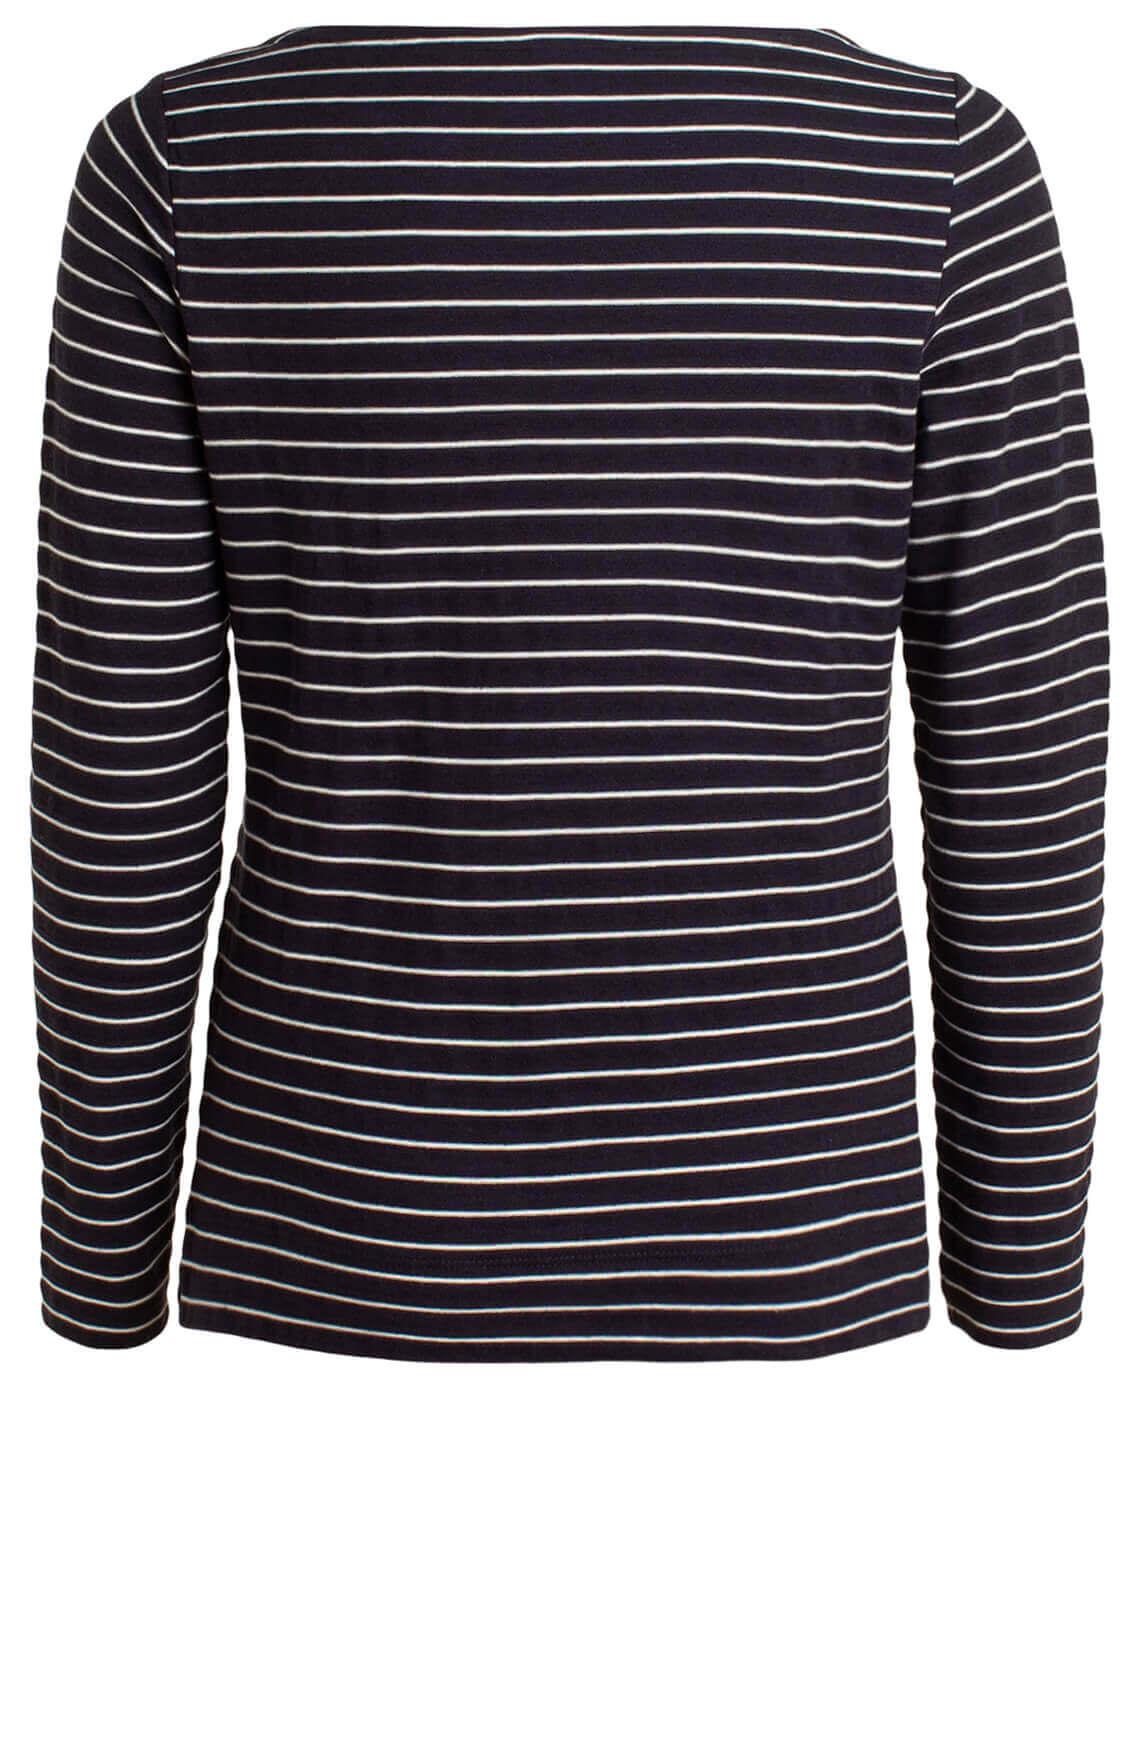 Marc O'Polo Dames Shirt met strepen Blauw